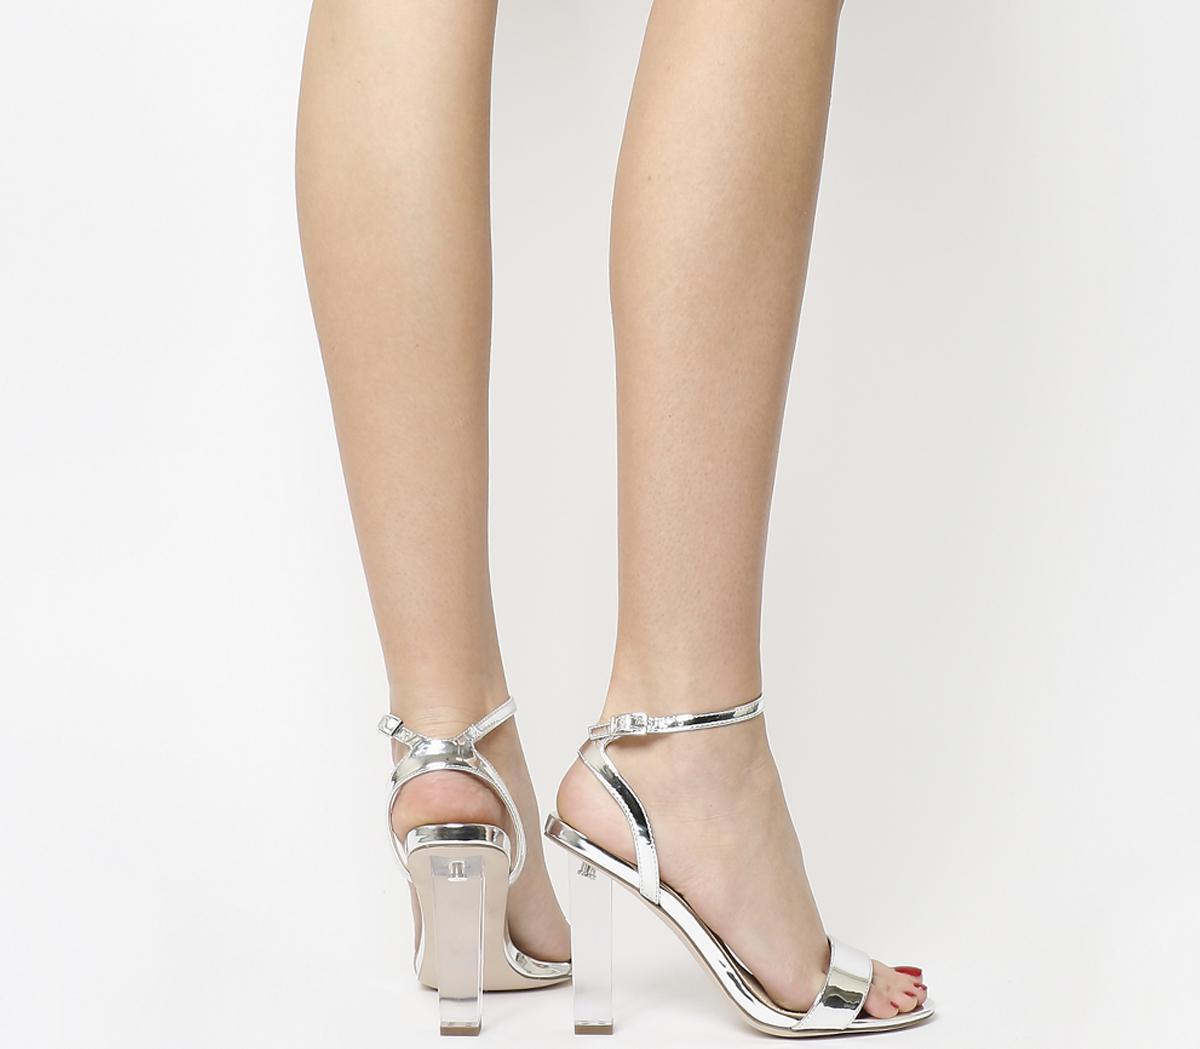 c9b012f1533 Office Hover Perspex Heel Sandals in Metallic - Lyst